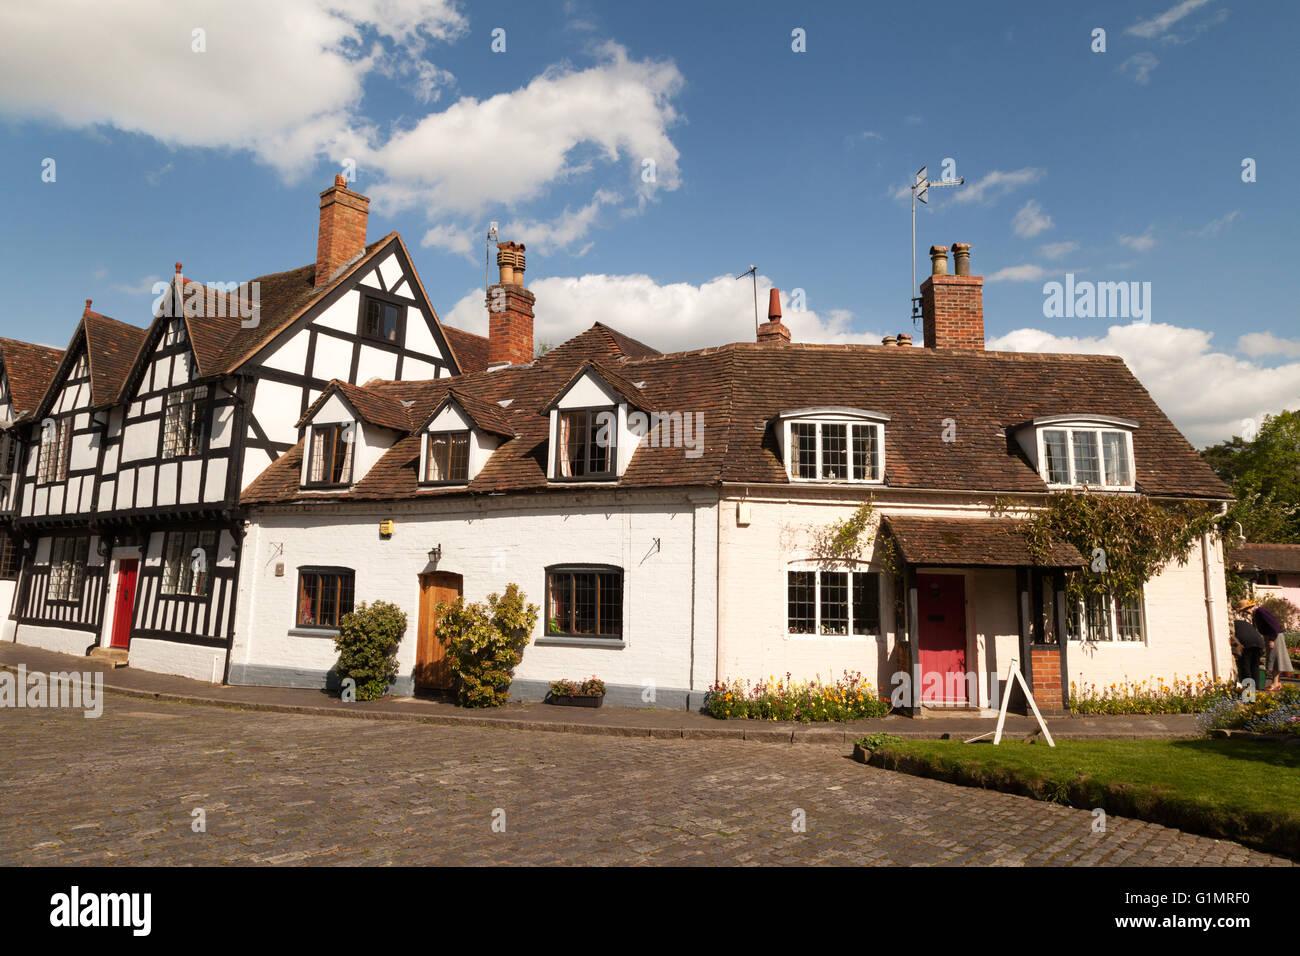 Tudor half timbered black and white medieval houses, Mill Street, Warwick, Warwickshire UK - Stock Image